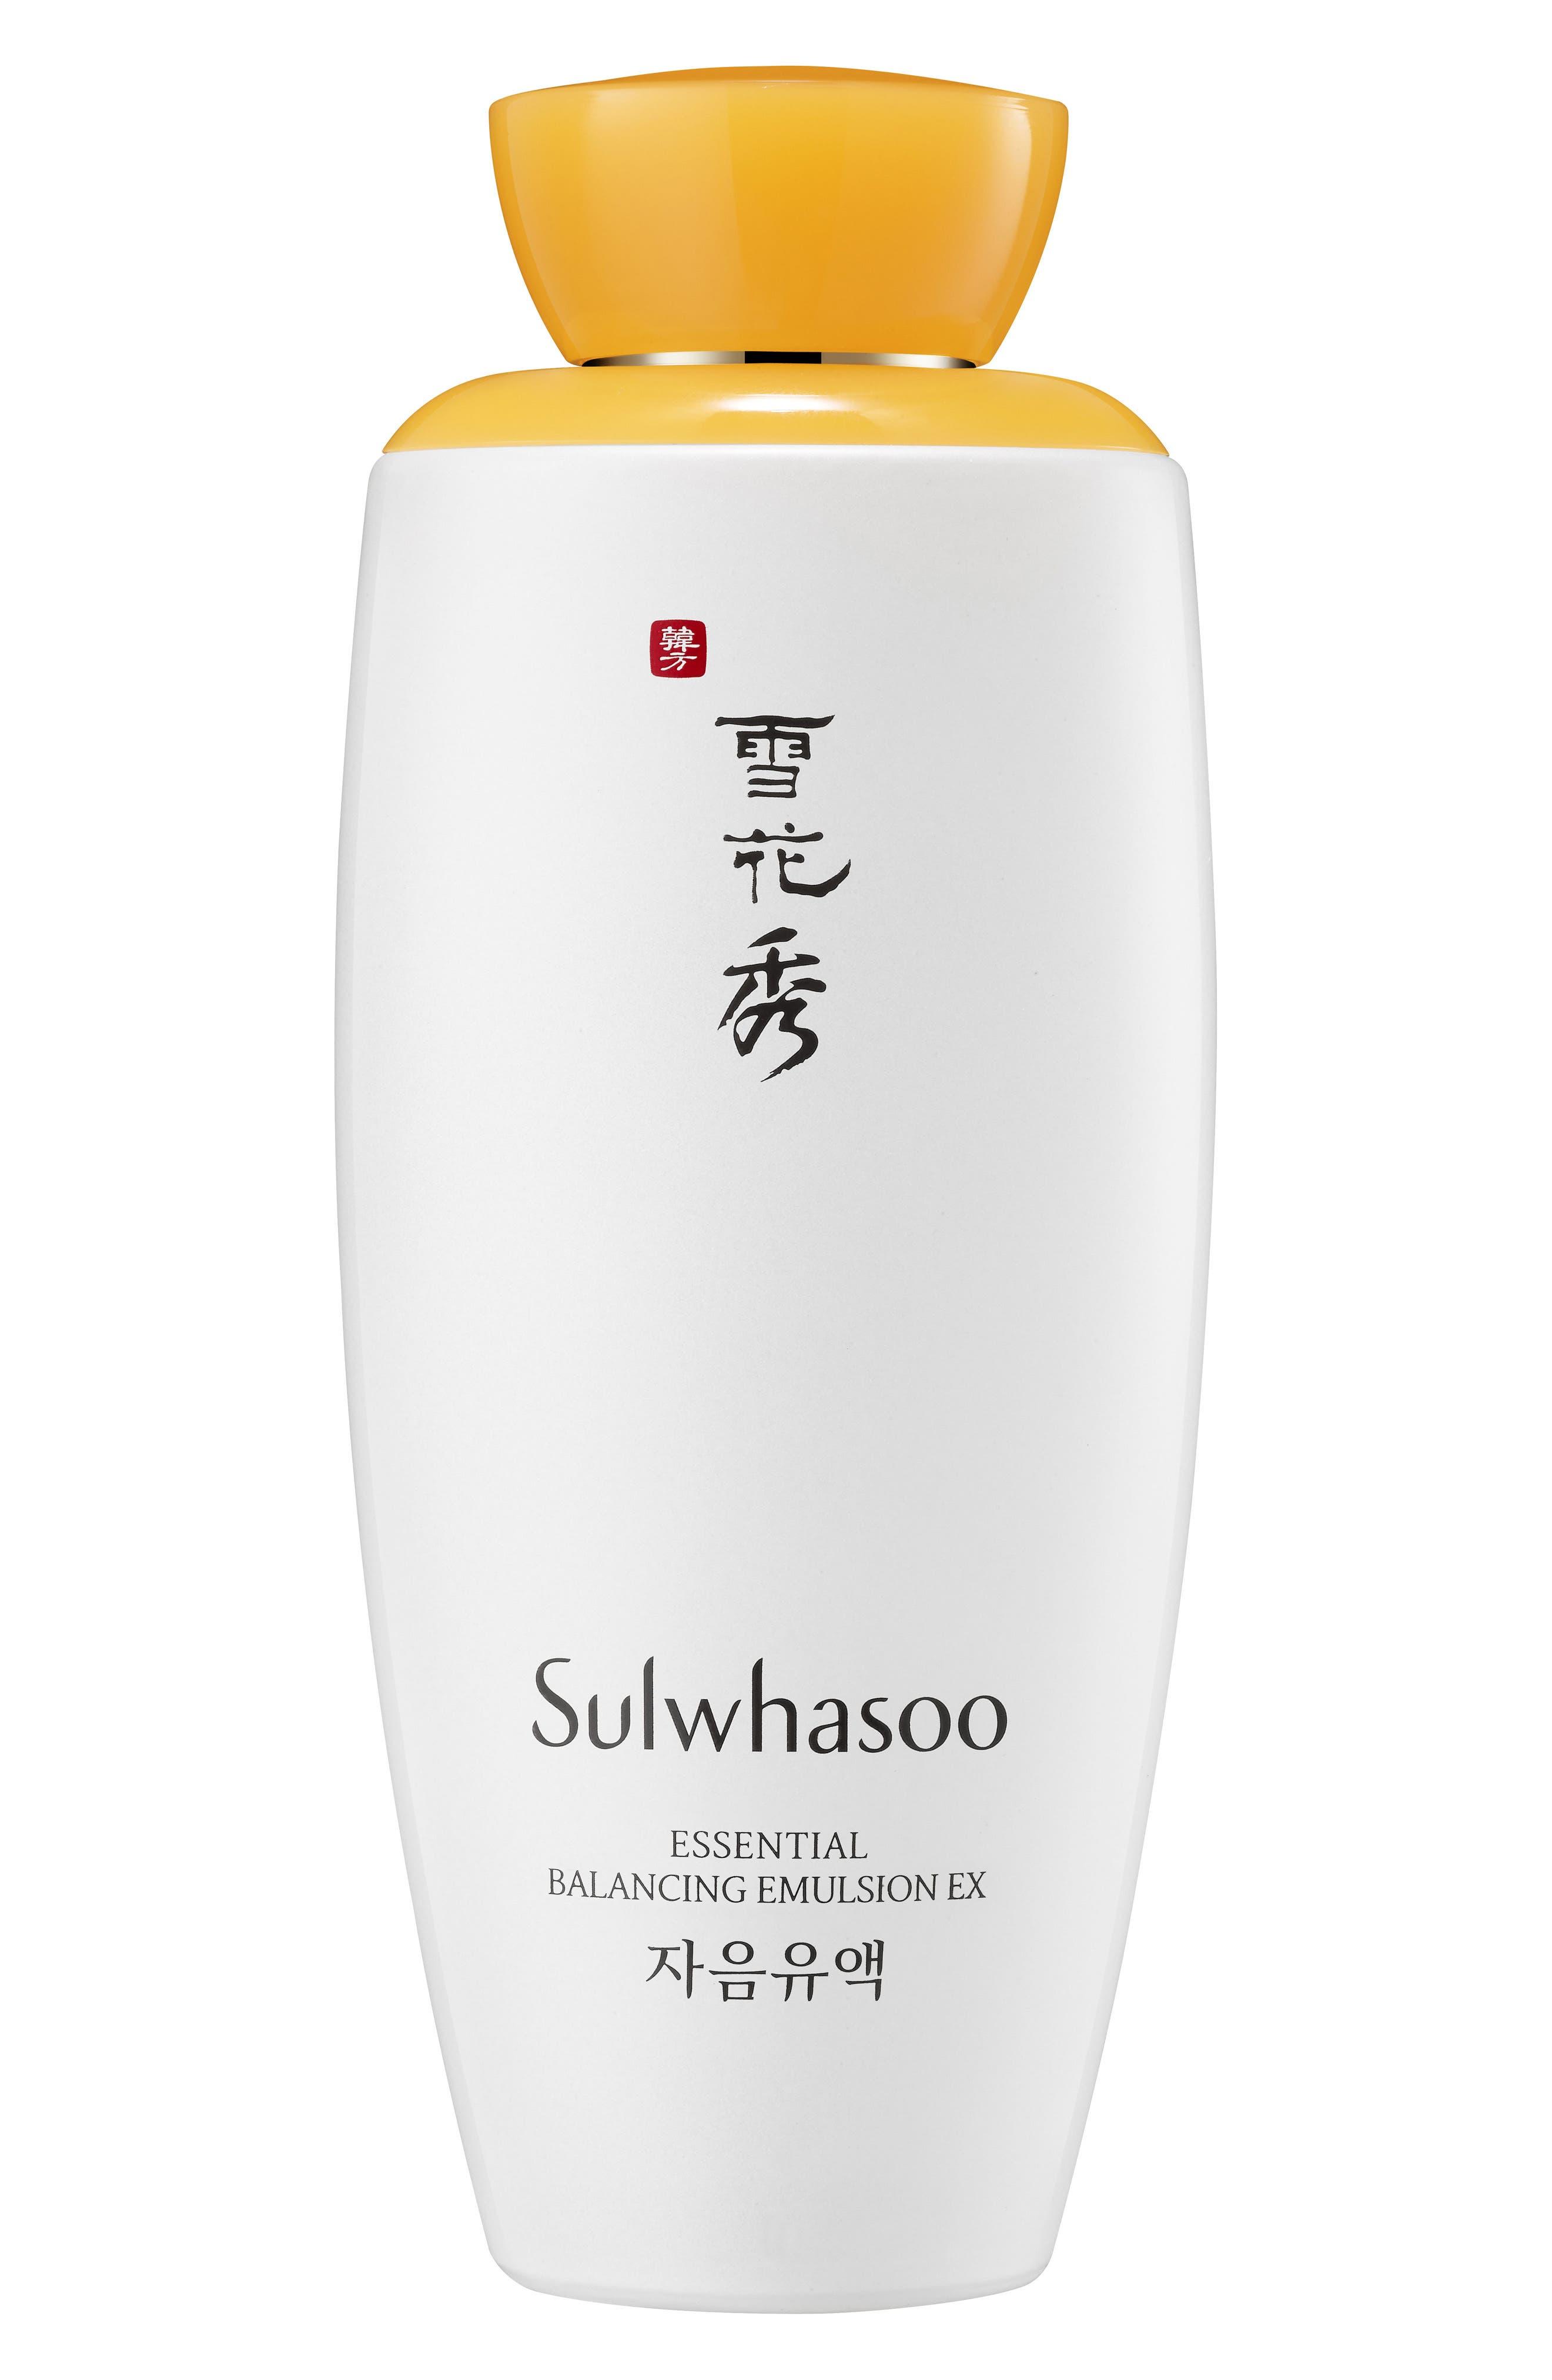 Alternate Image 1 Selected - Sulwhasoo Essential Balancing Emulsion EX